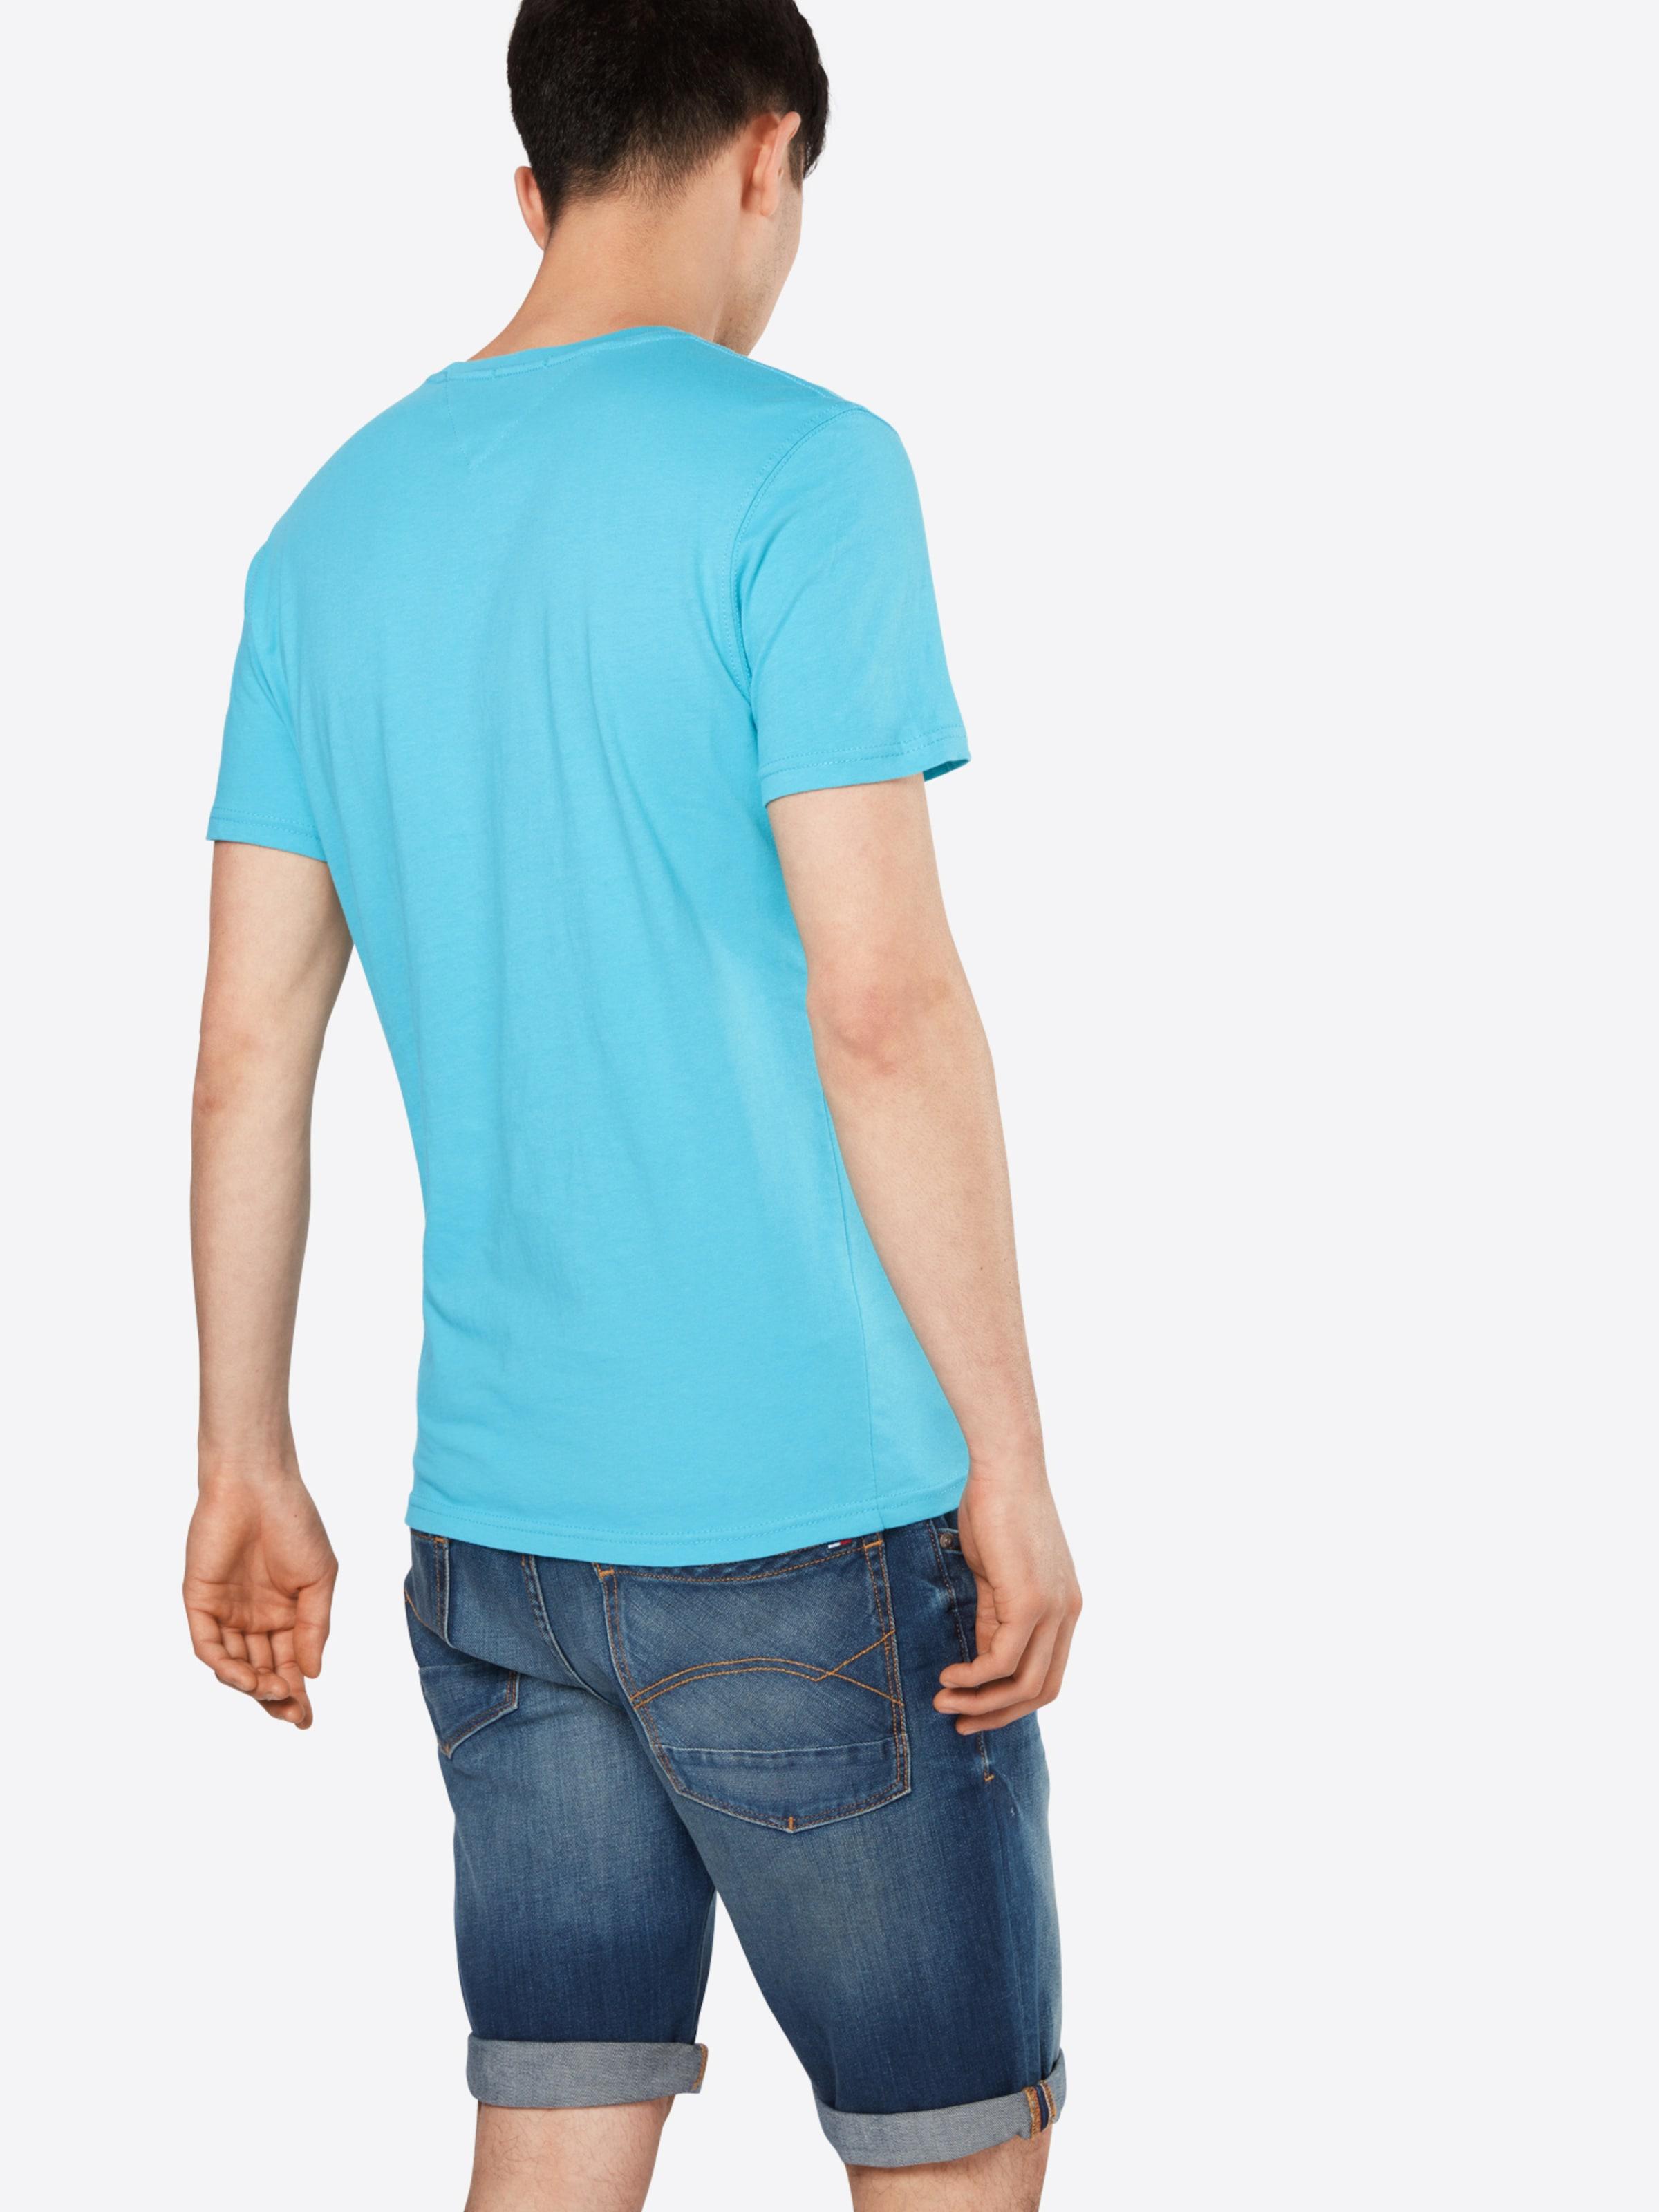 Tommy Jeans Logo-Shirt mit Print Rabatt 4e0gViz